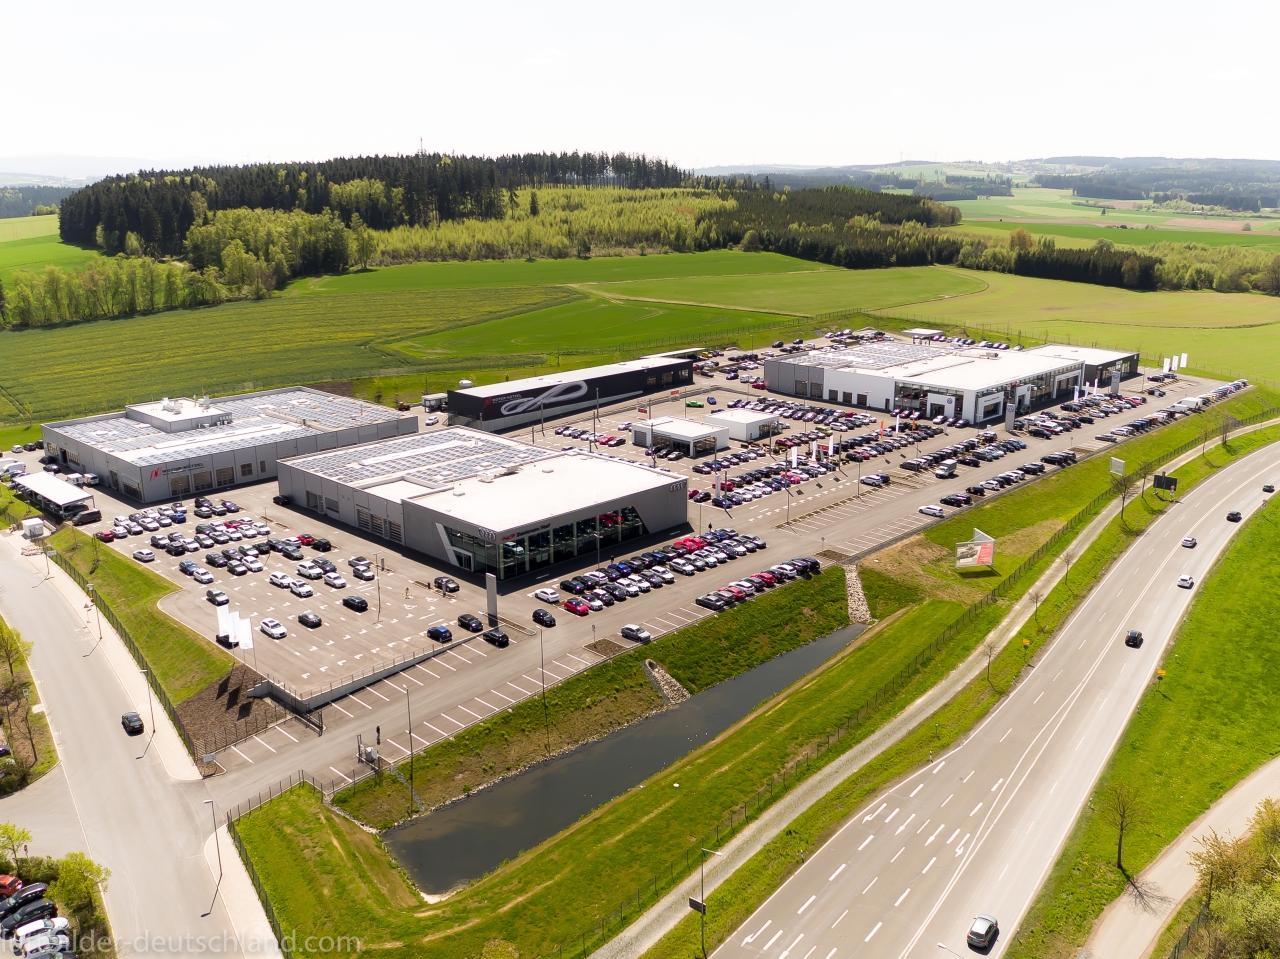 Motor Nützel Hof, VW, Audi, Skoda, luftbilder-deutschland.com